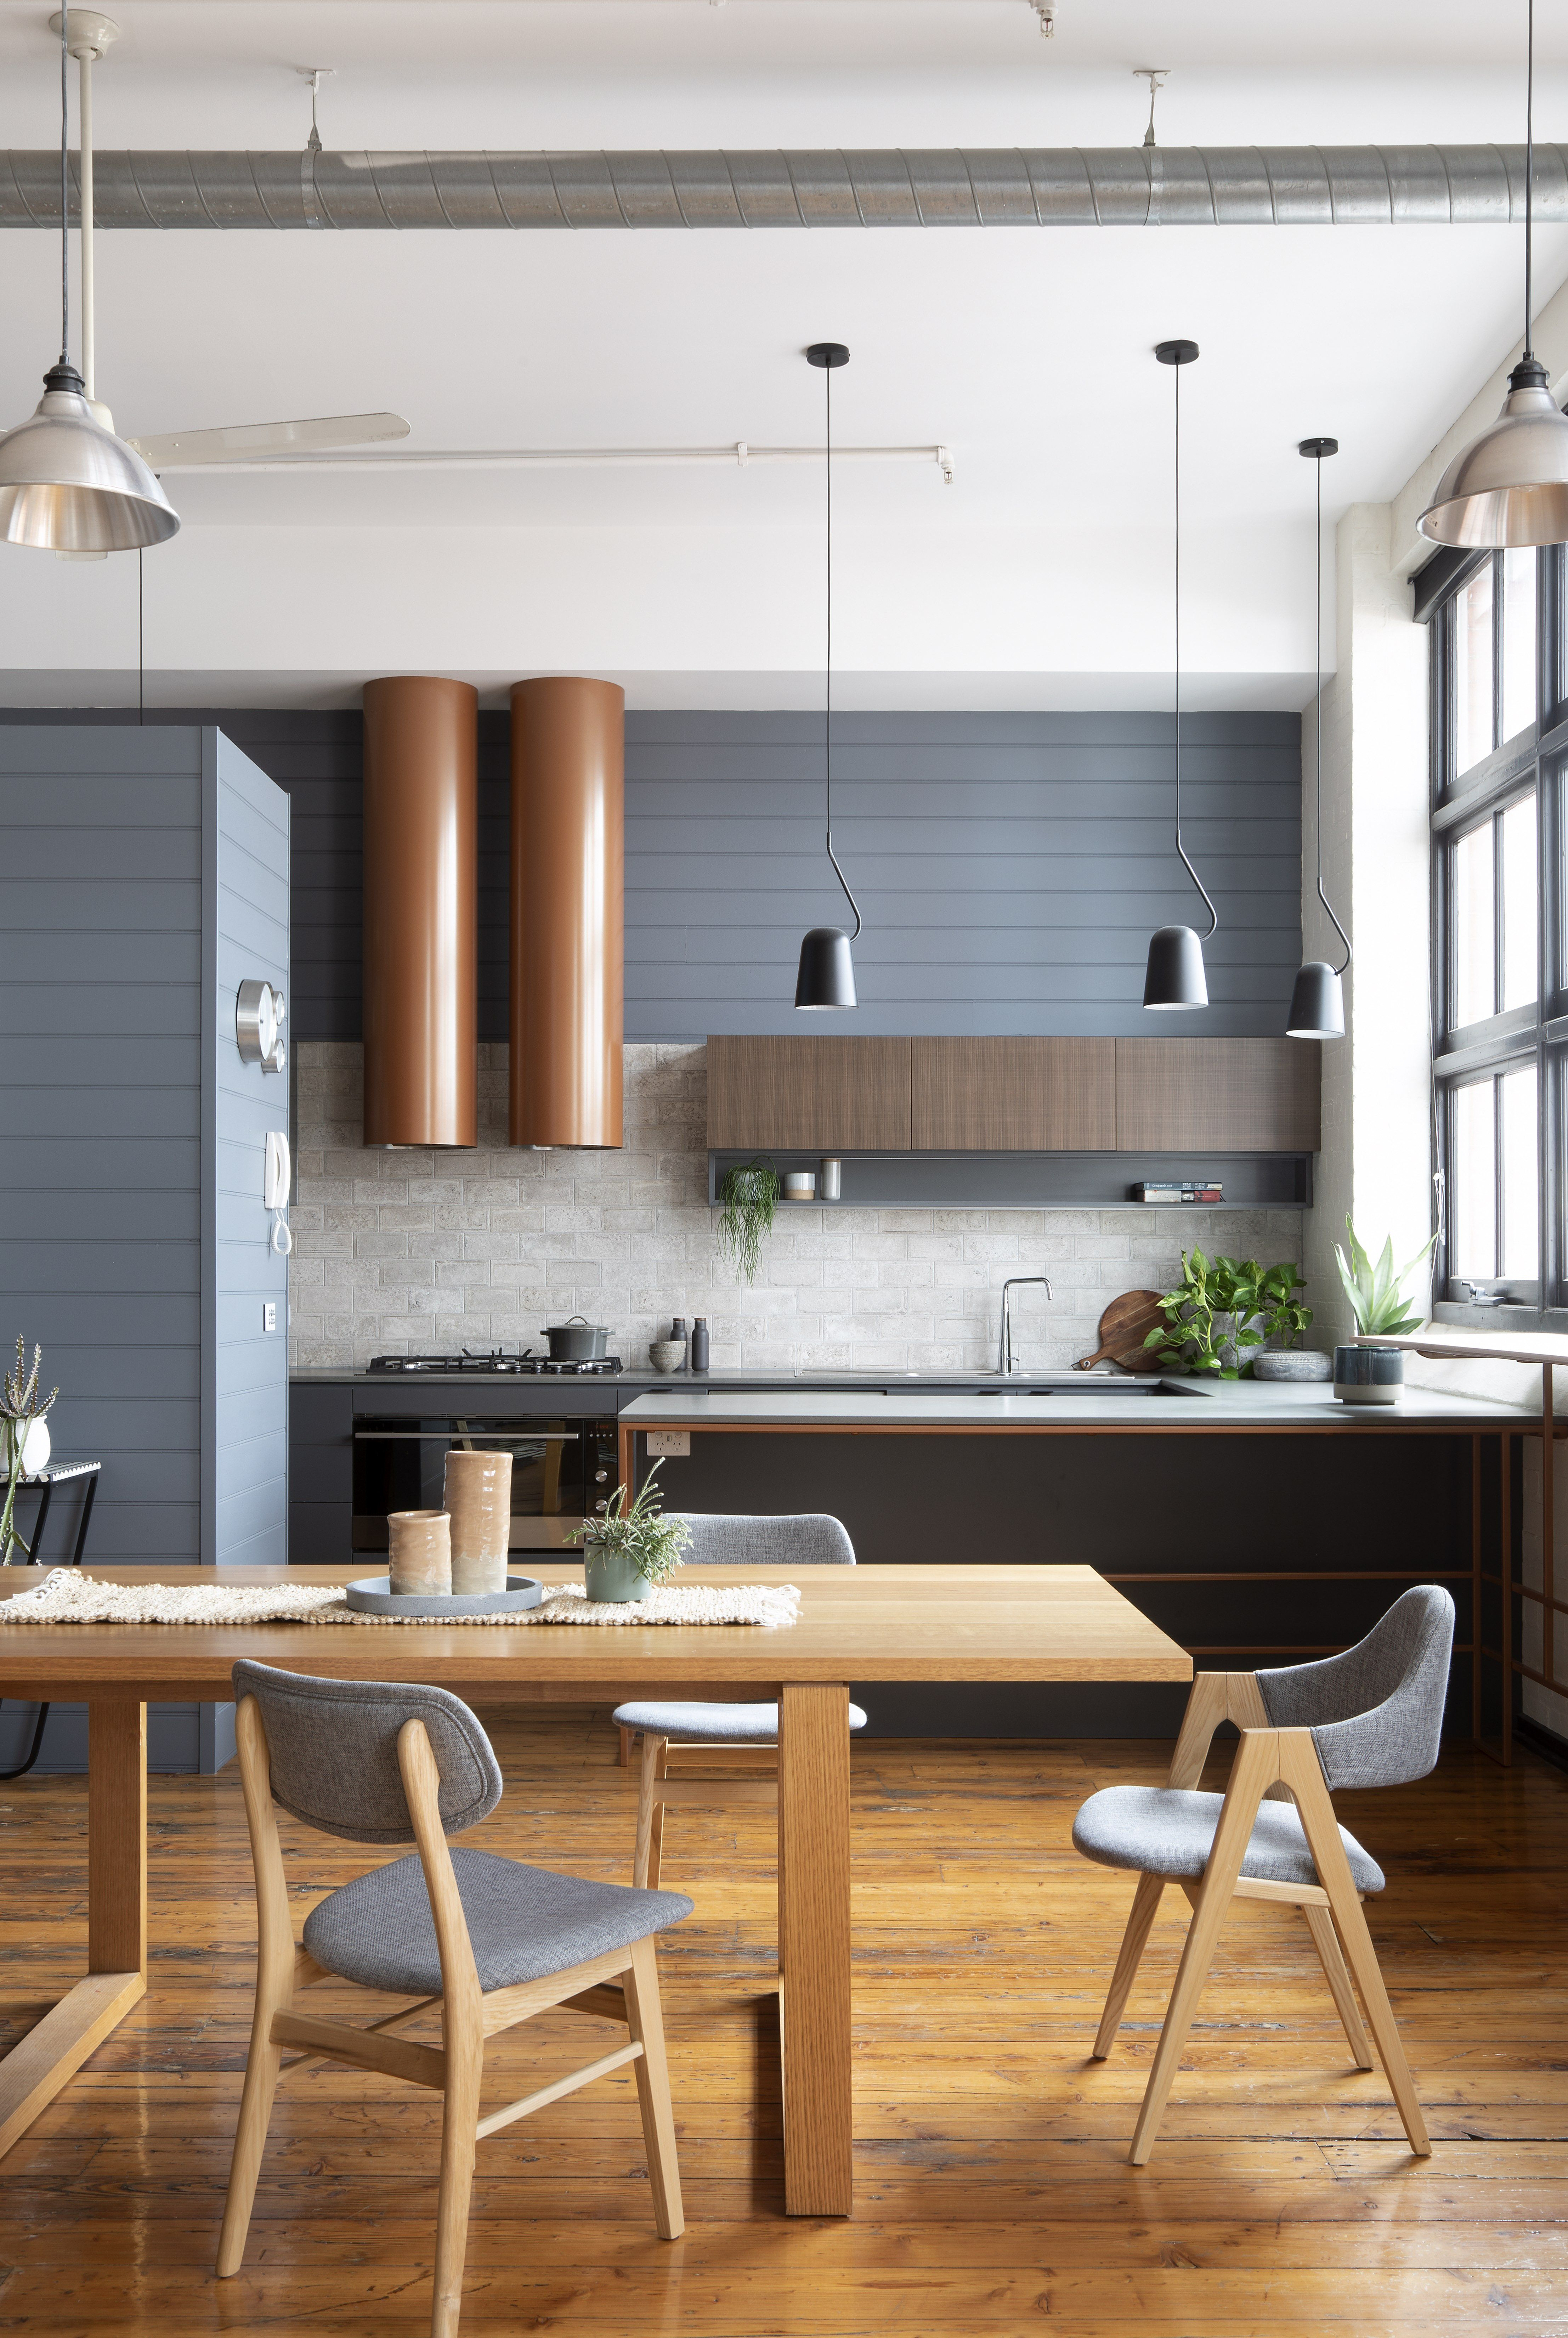 Kitchen renovation image by Jasmine McClelland Design on